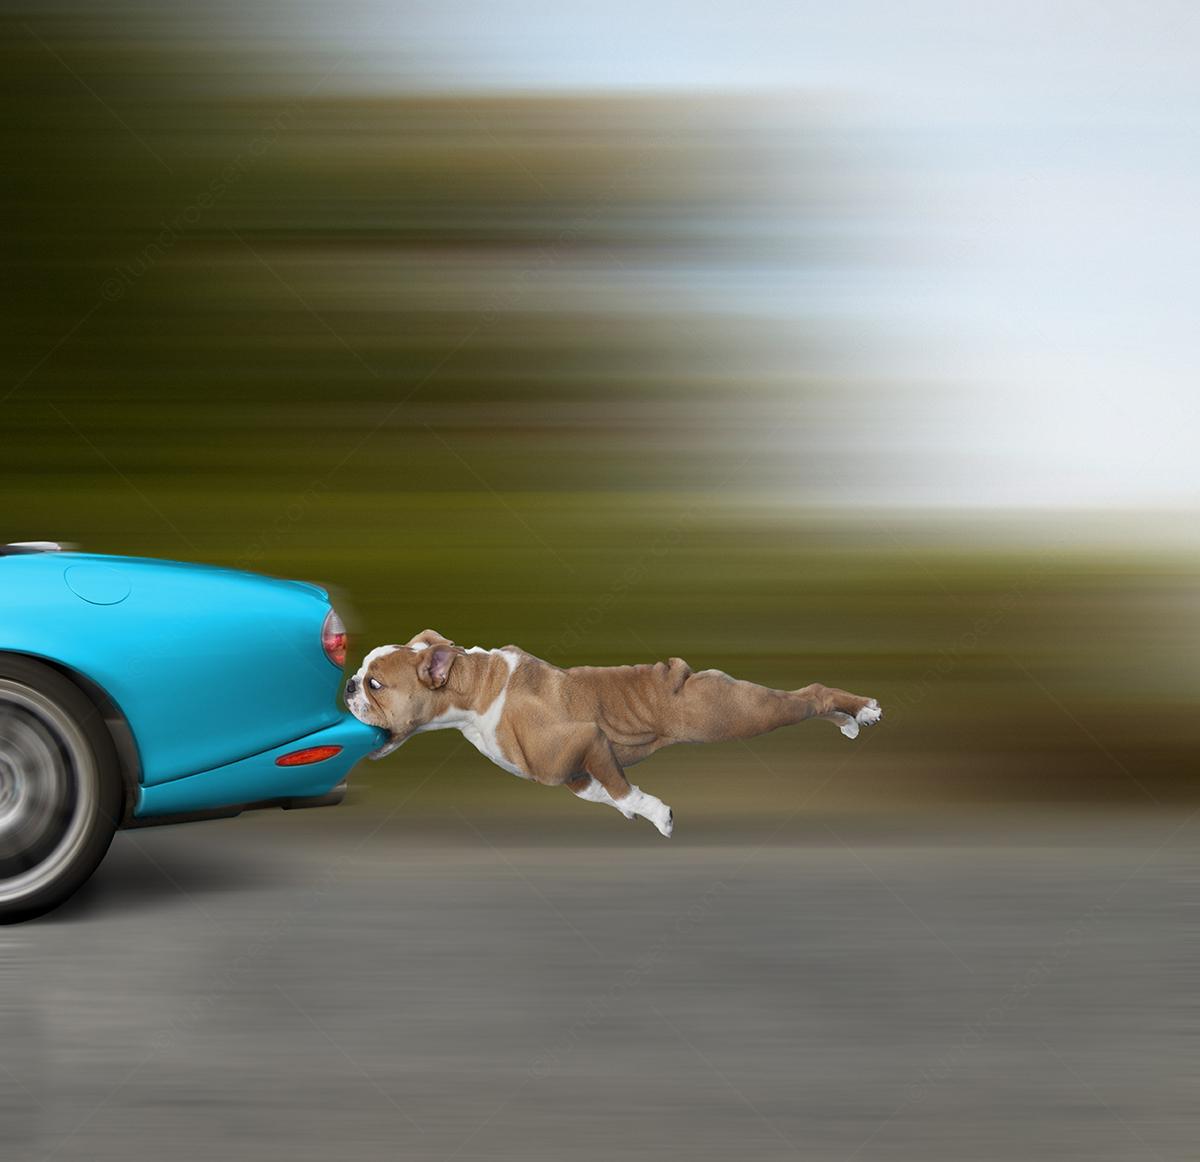 Funny_Bulldog_Biting_A_Car_Bumper